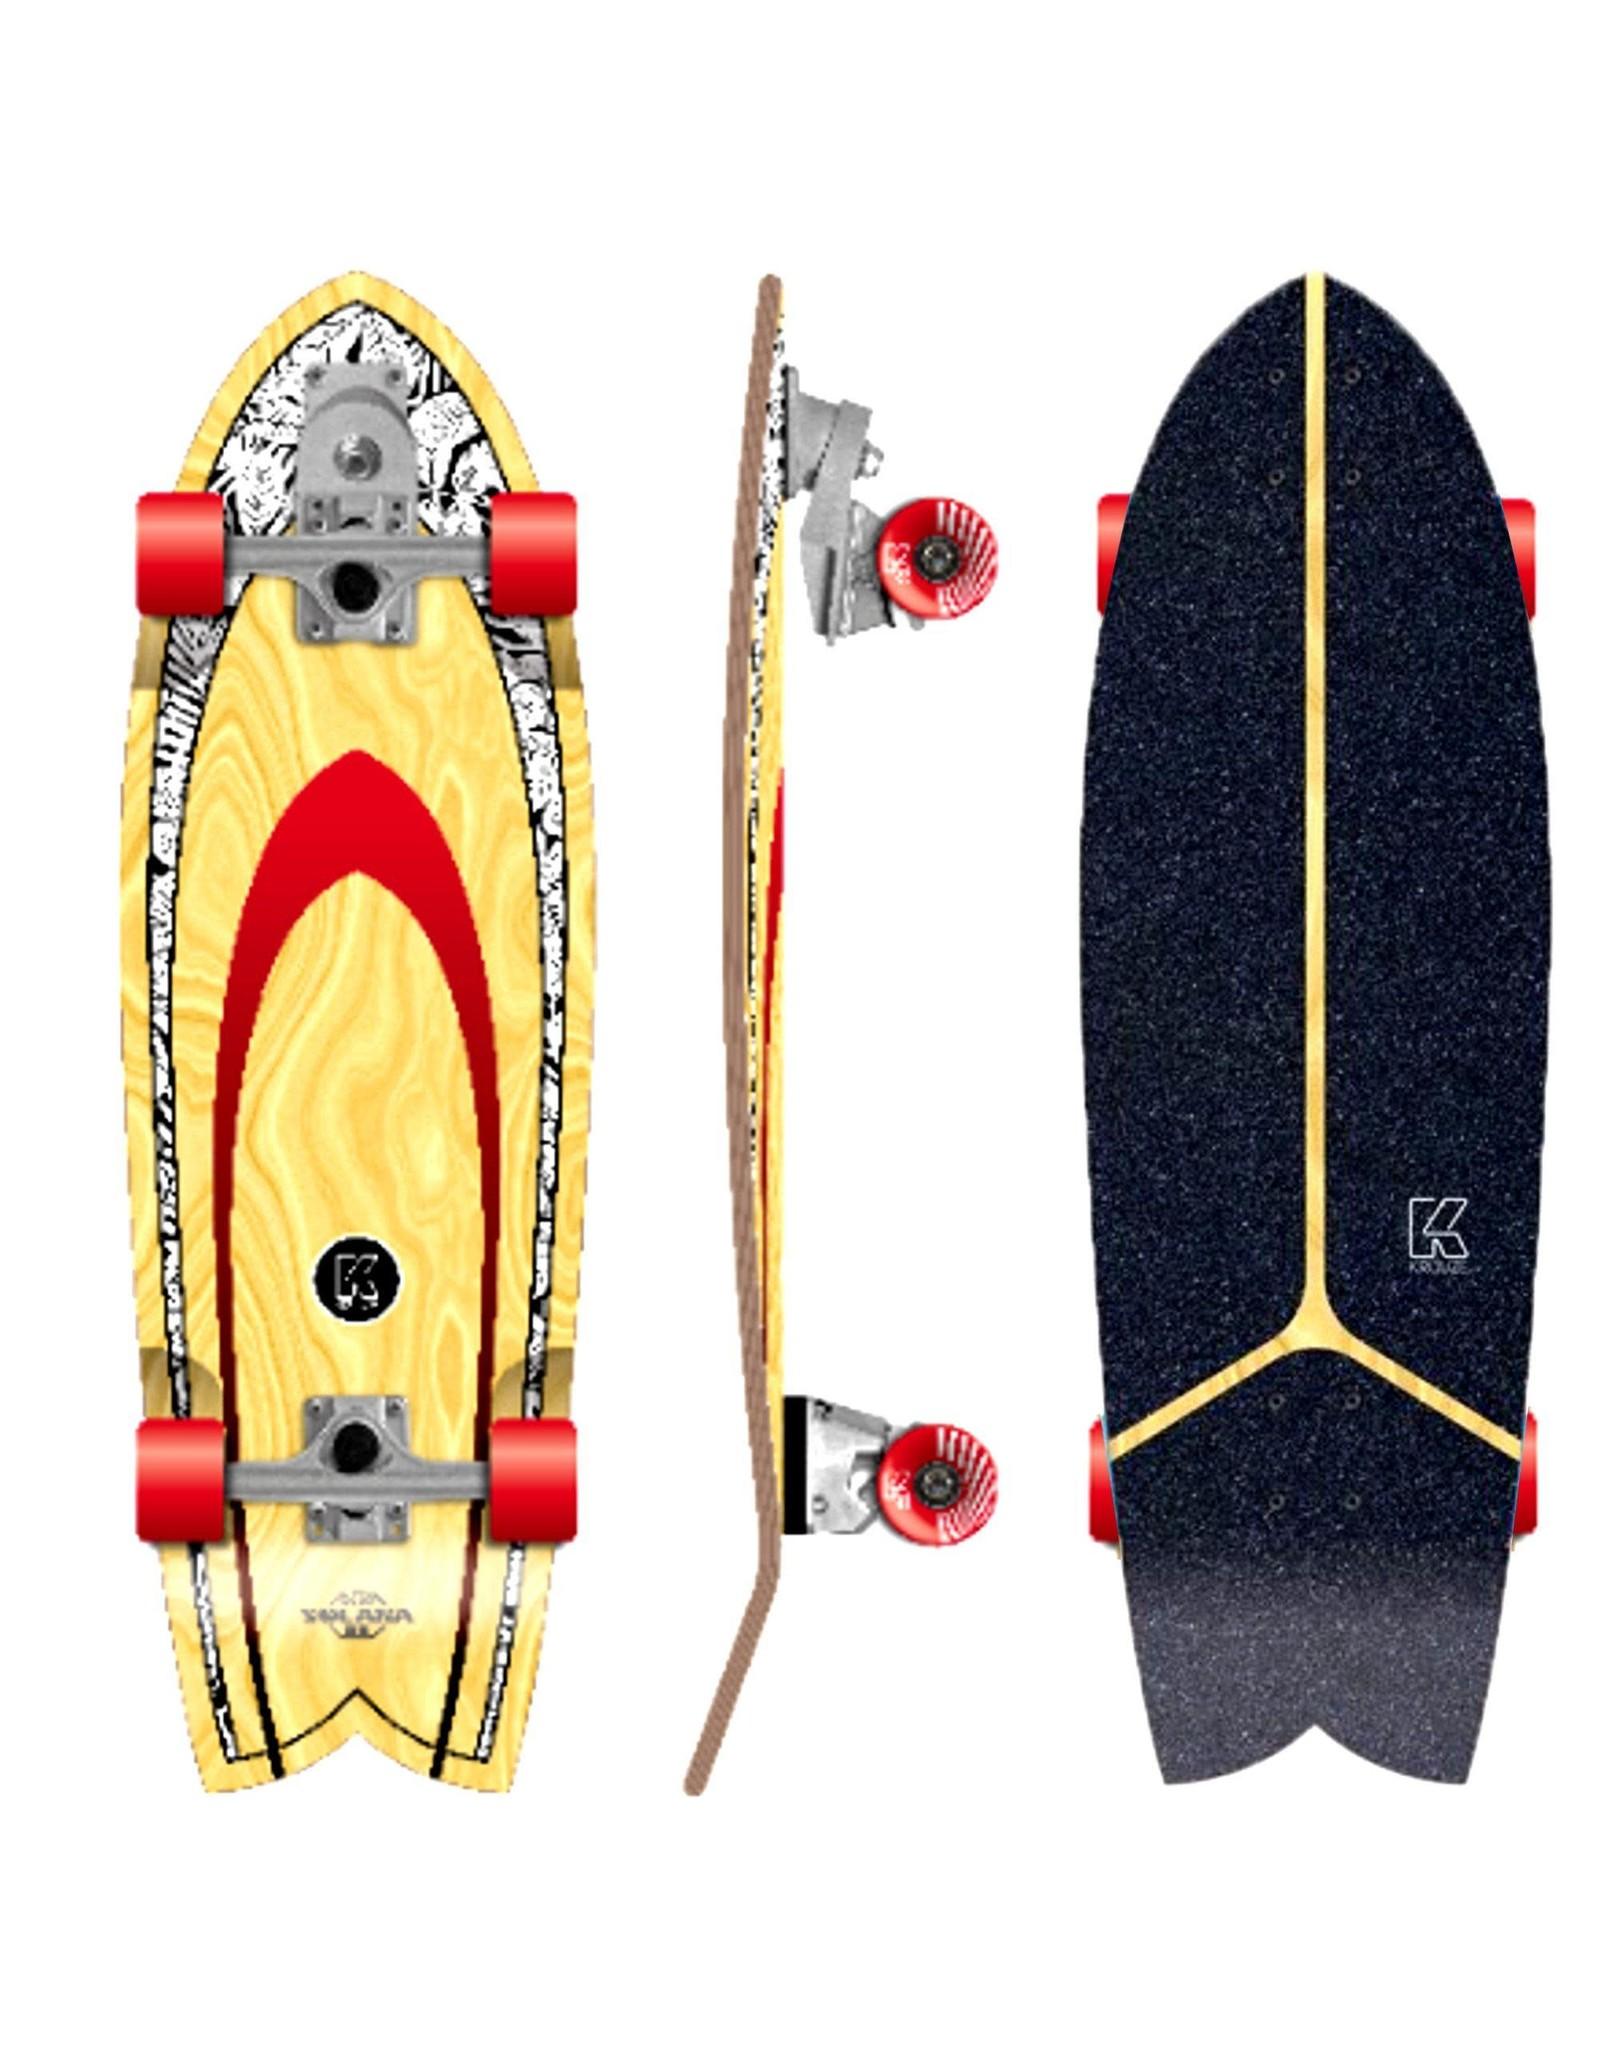 Kruuze Flying Wheels Surf Skateboard Solana 32 Blackleaf